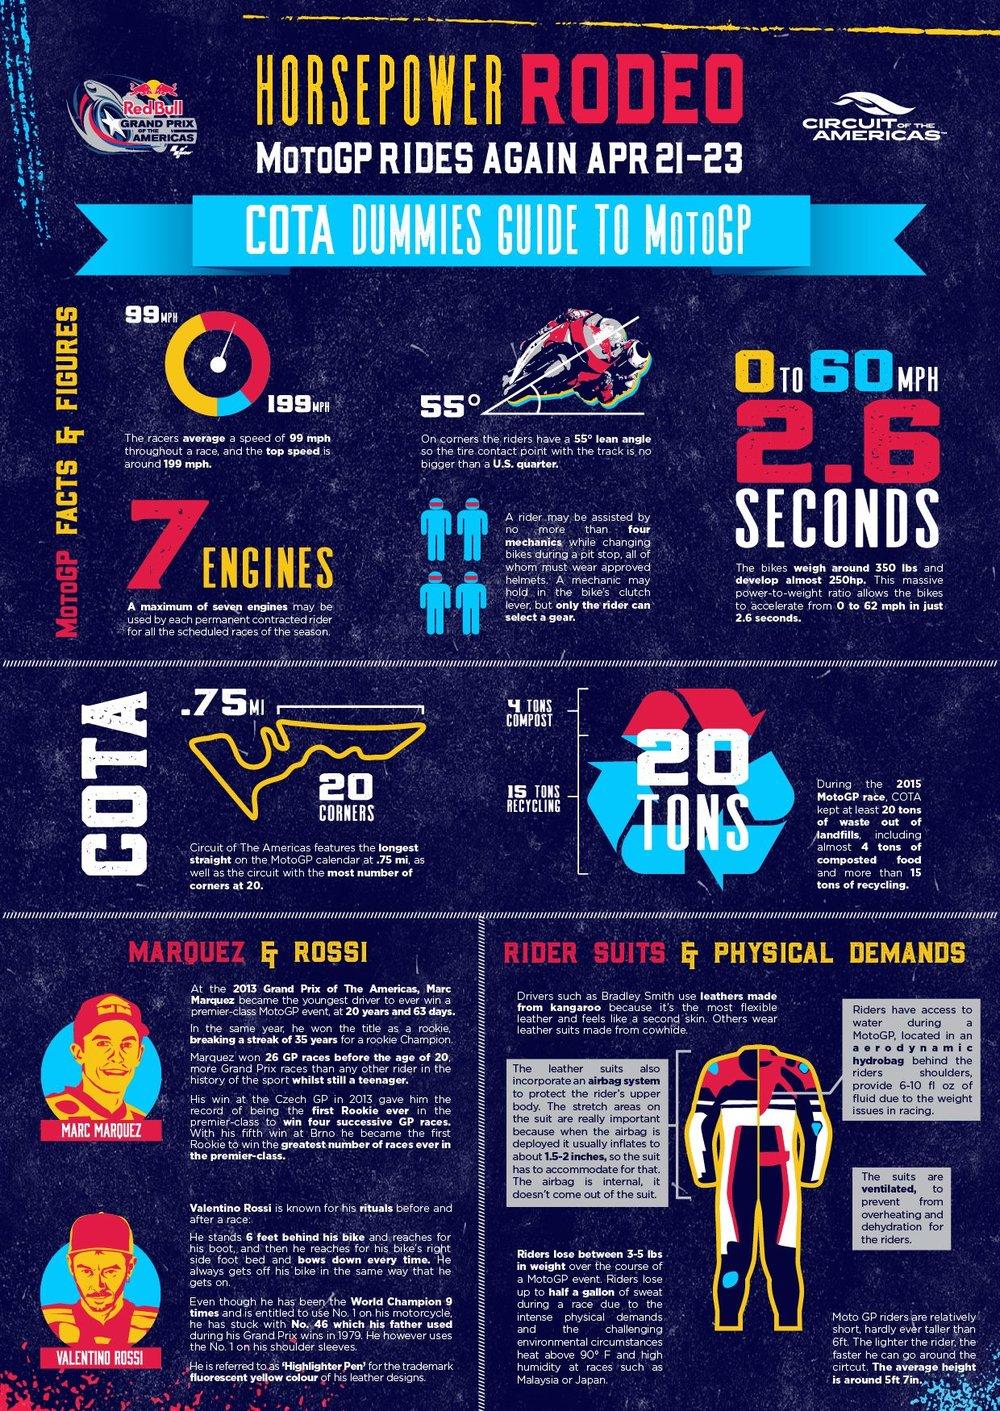 COTA_MotoGP_Infographic.jpg